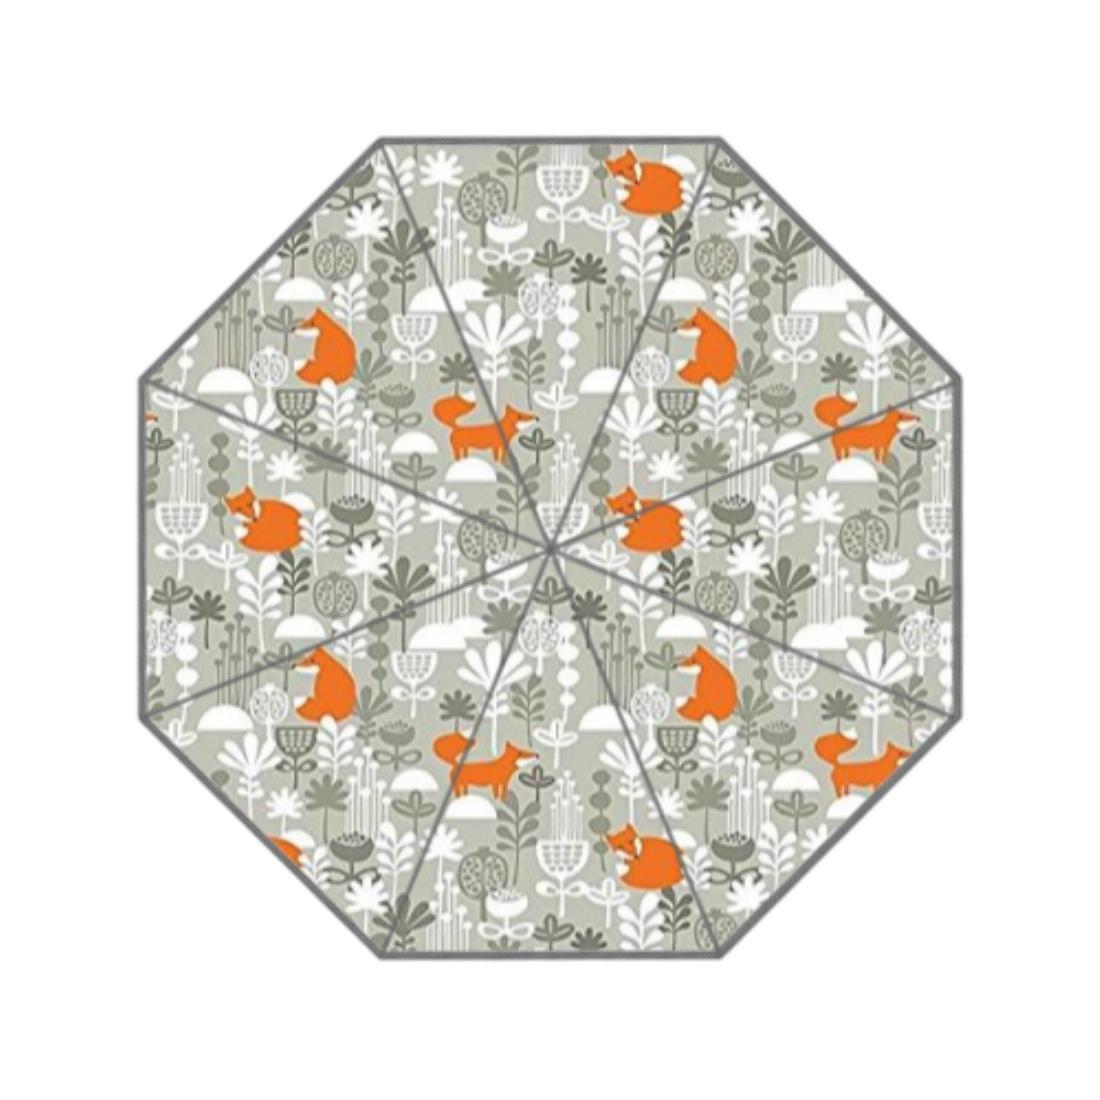 Foldable Umbrella Travel Umbrellas for Women Coolstuffs Pretty Patterns!